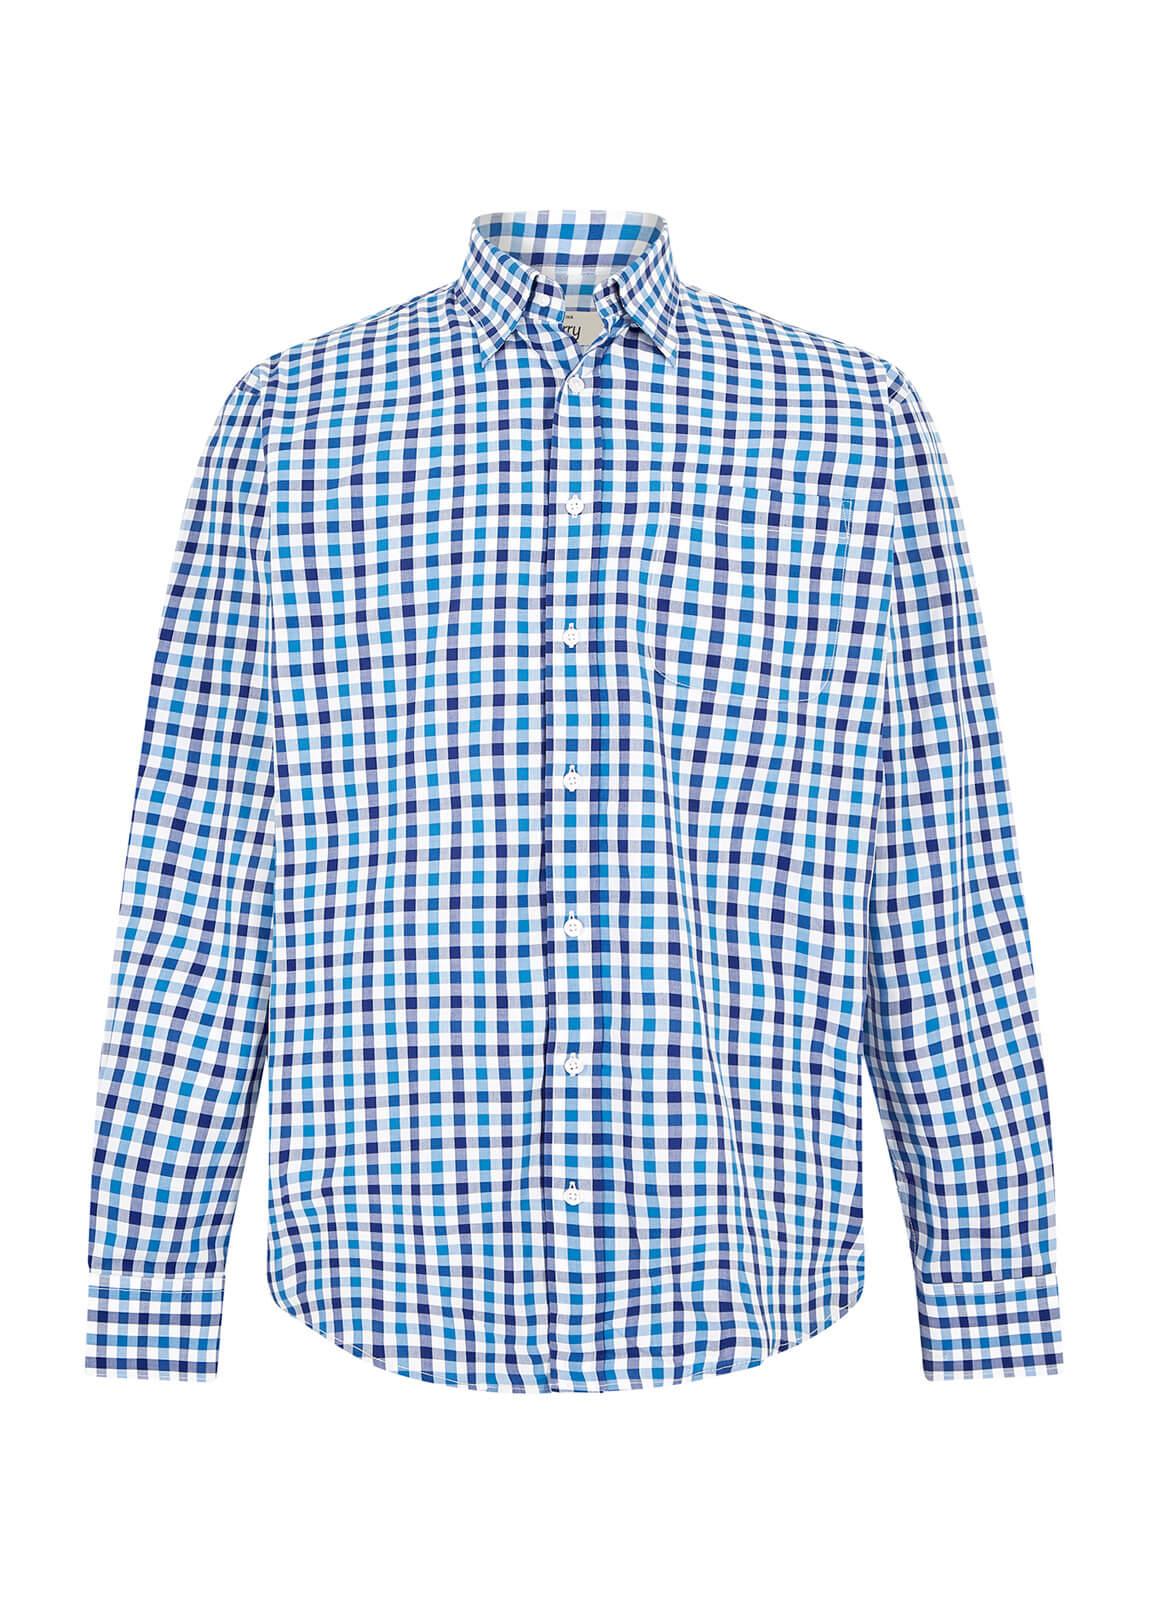 Dubarry_Coachford Shirt - Royal Blue_Image_2